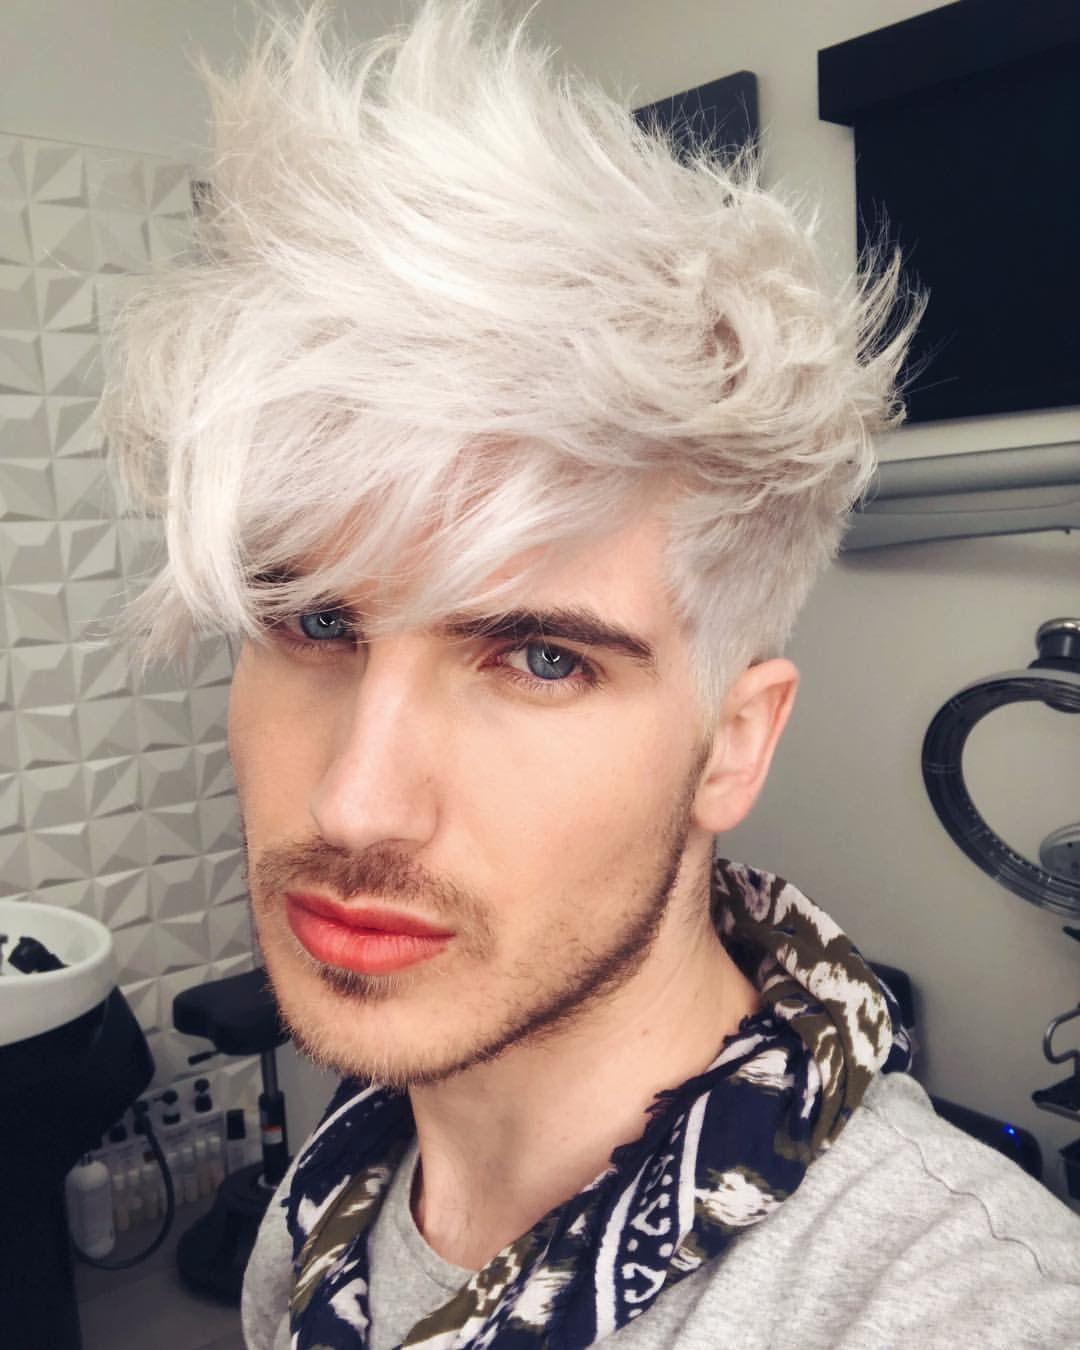 Pin De Clifford Hattingh Em Hair Cabelo Masculino Cabelo